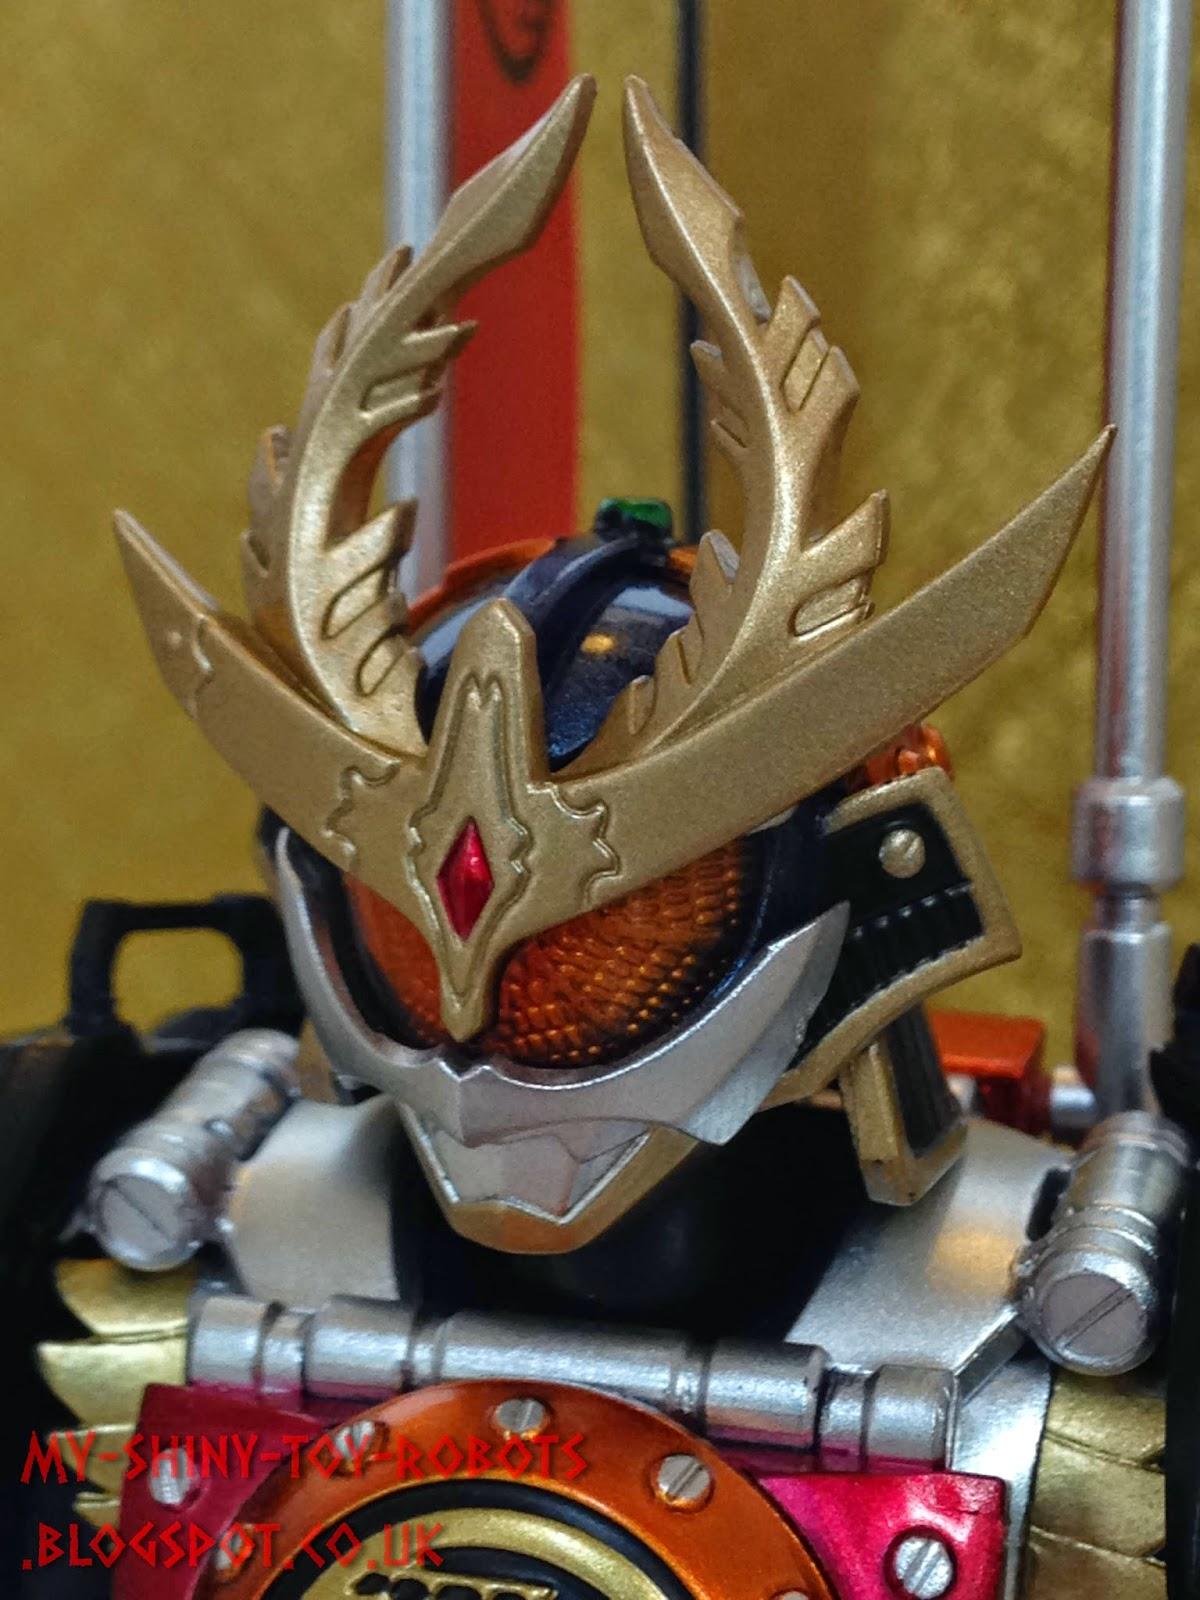 S.H. Figuarts Kamen Rider Gaim Kachidoki Arms